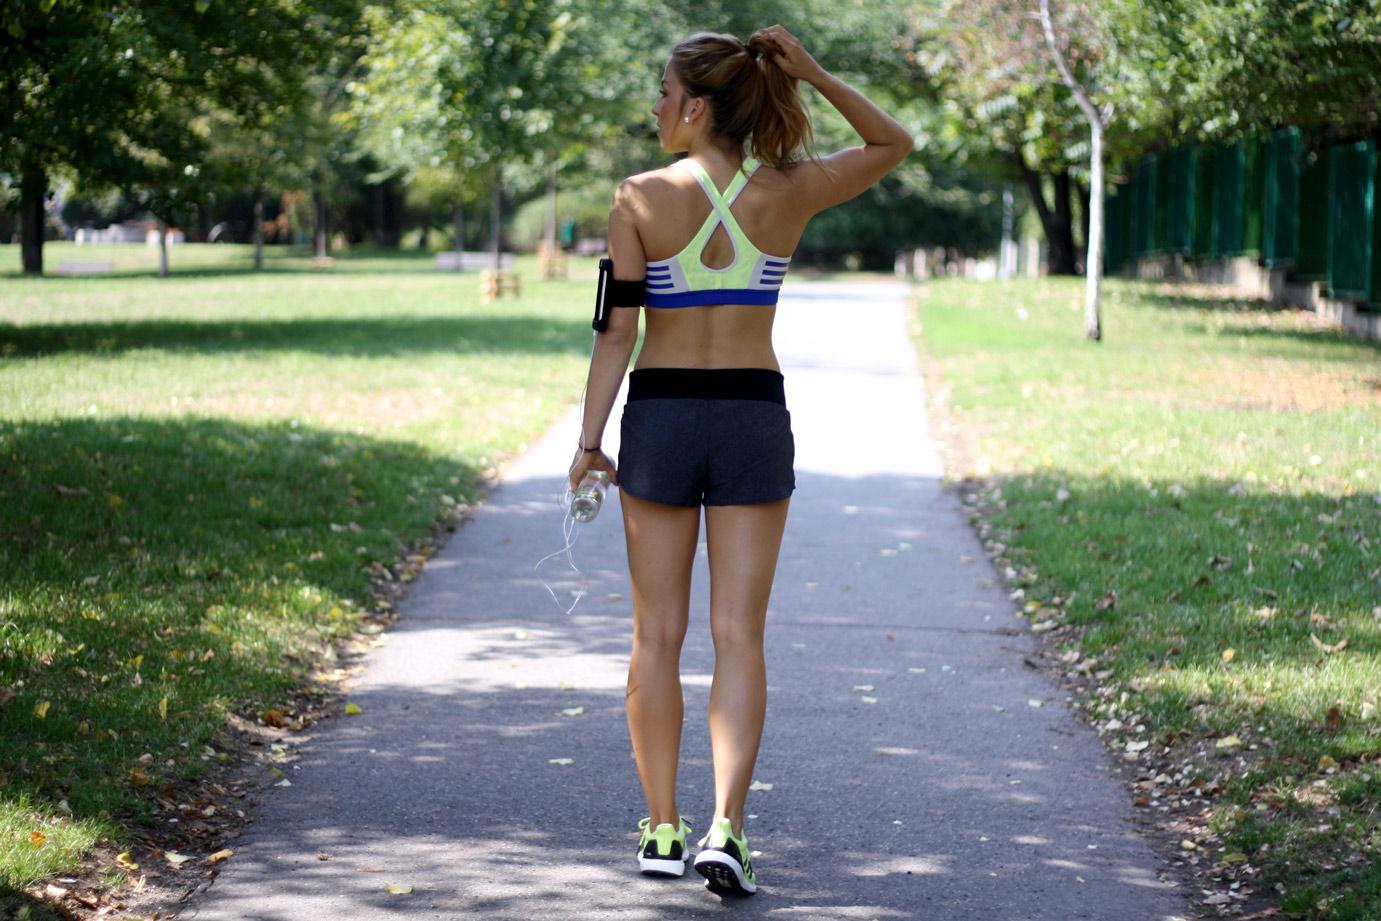 #ADIDASBLOGGERSCHALLENGE - THE BEST RUNNING OUTFIT 3